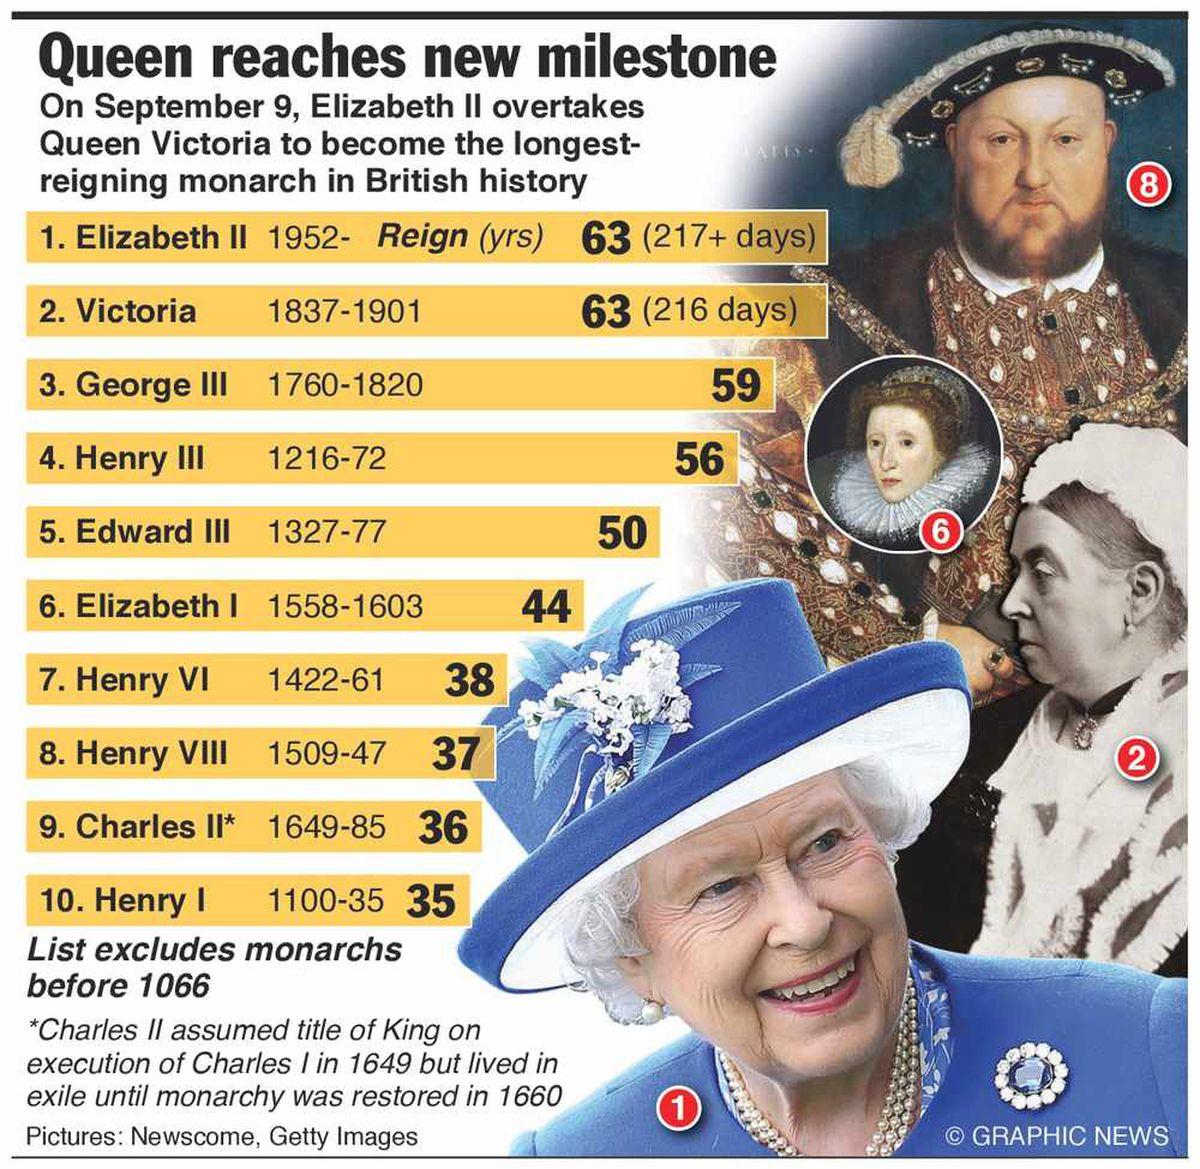 Queen Elizabeth II officially longest reigning British monarch